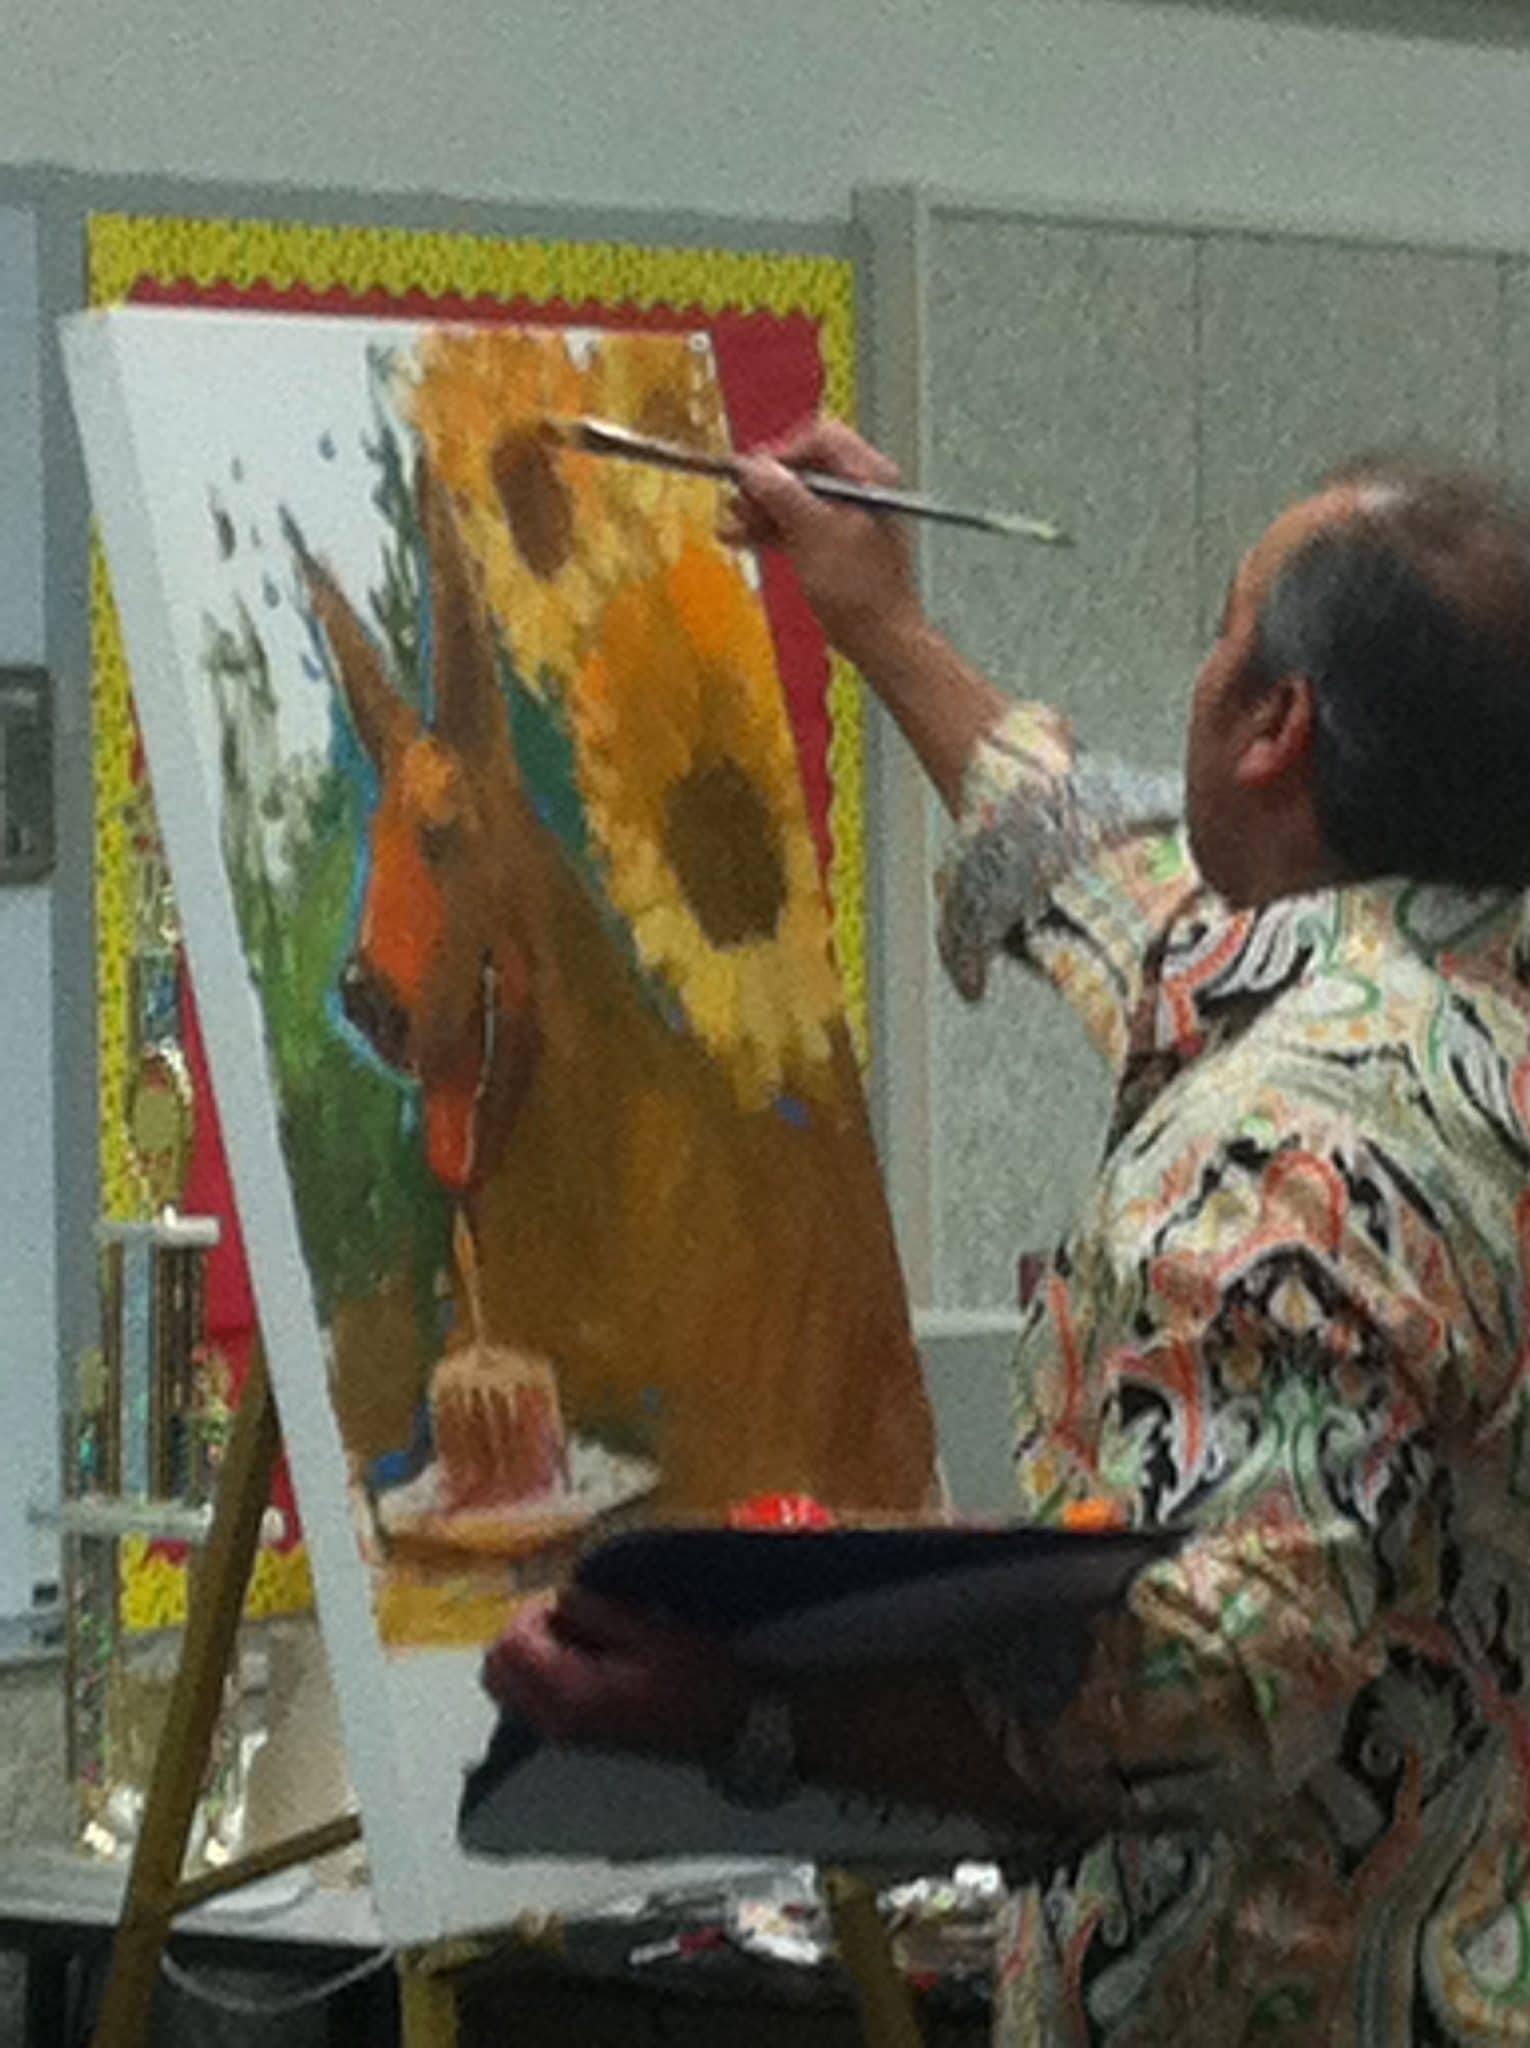 Marko Mavrovich, Park West Gallery